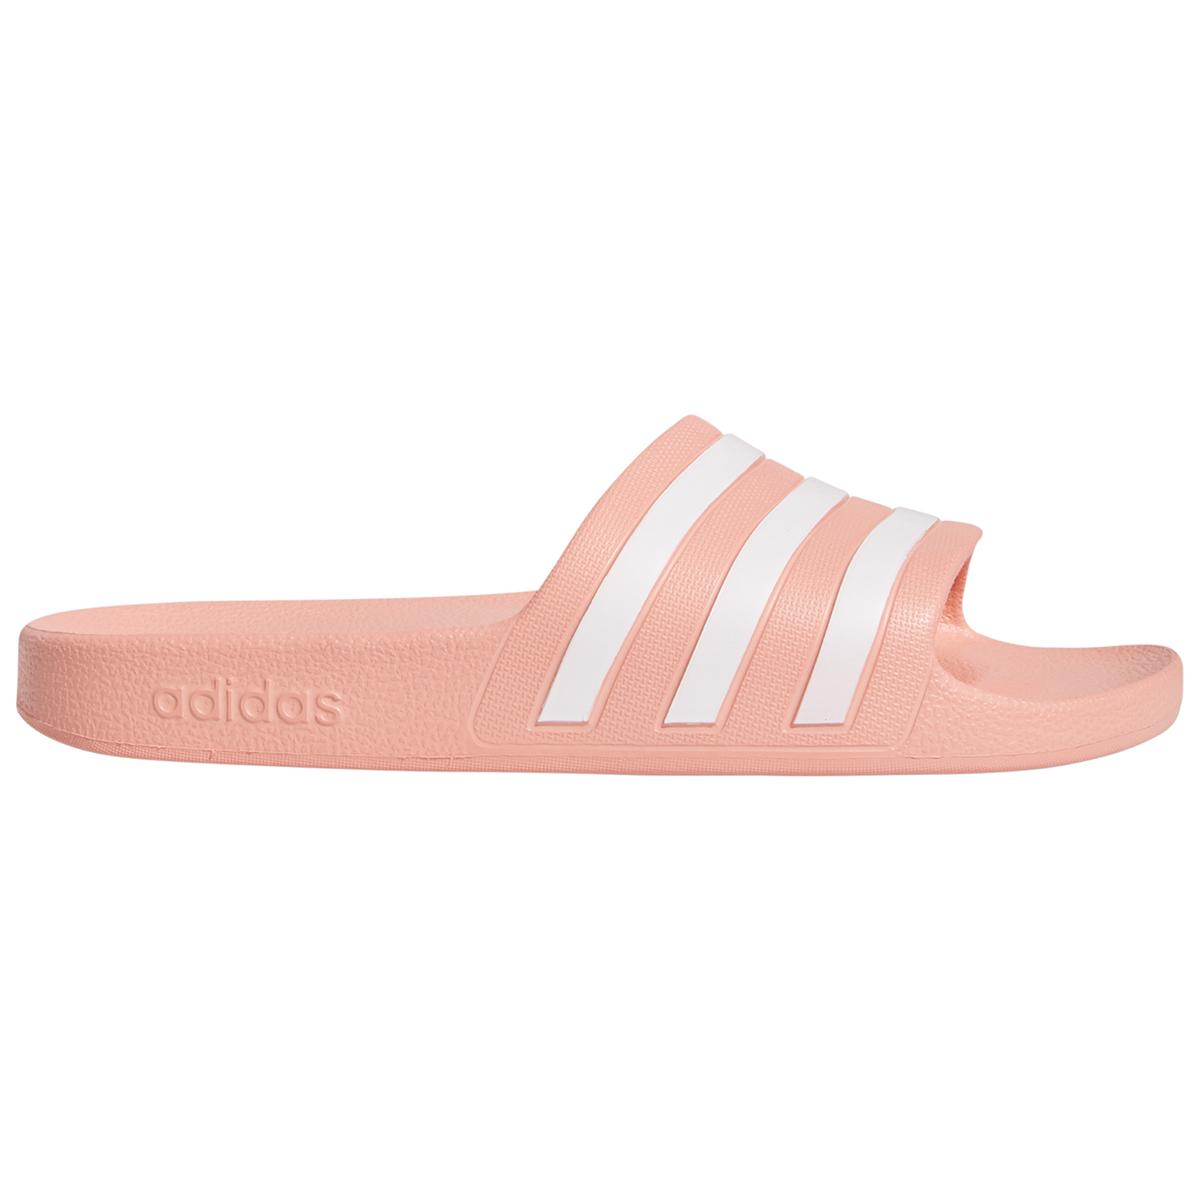 Adidas Women's Adilette Aqua Slide Sandals - Red, 9